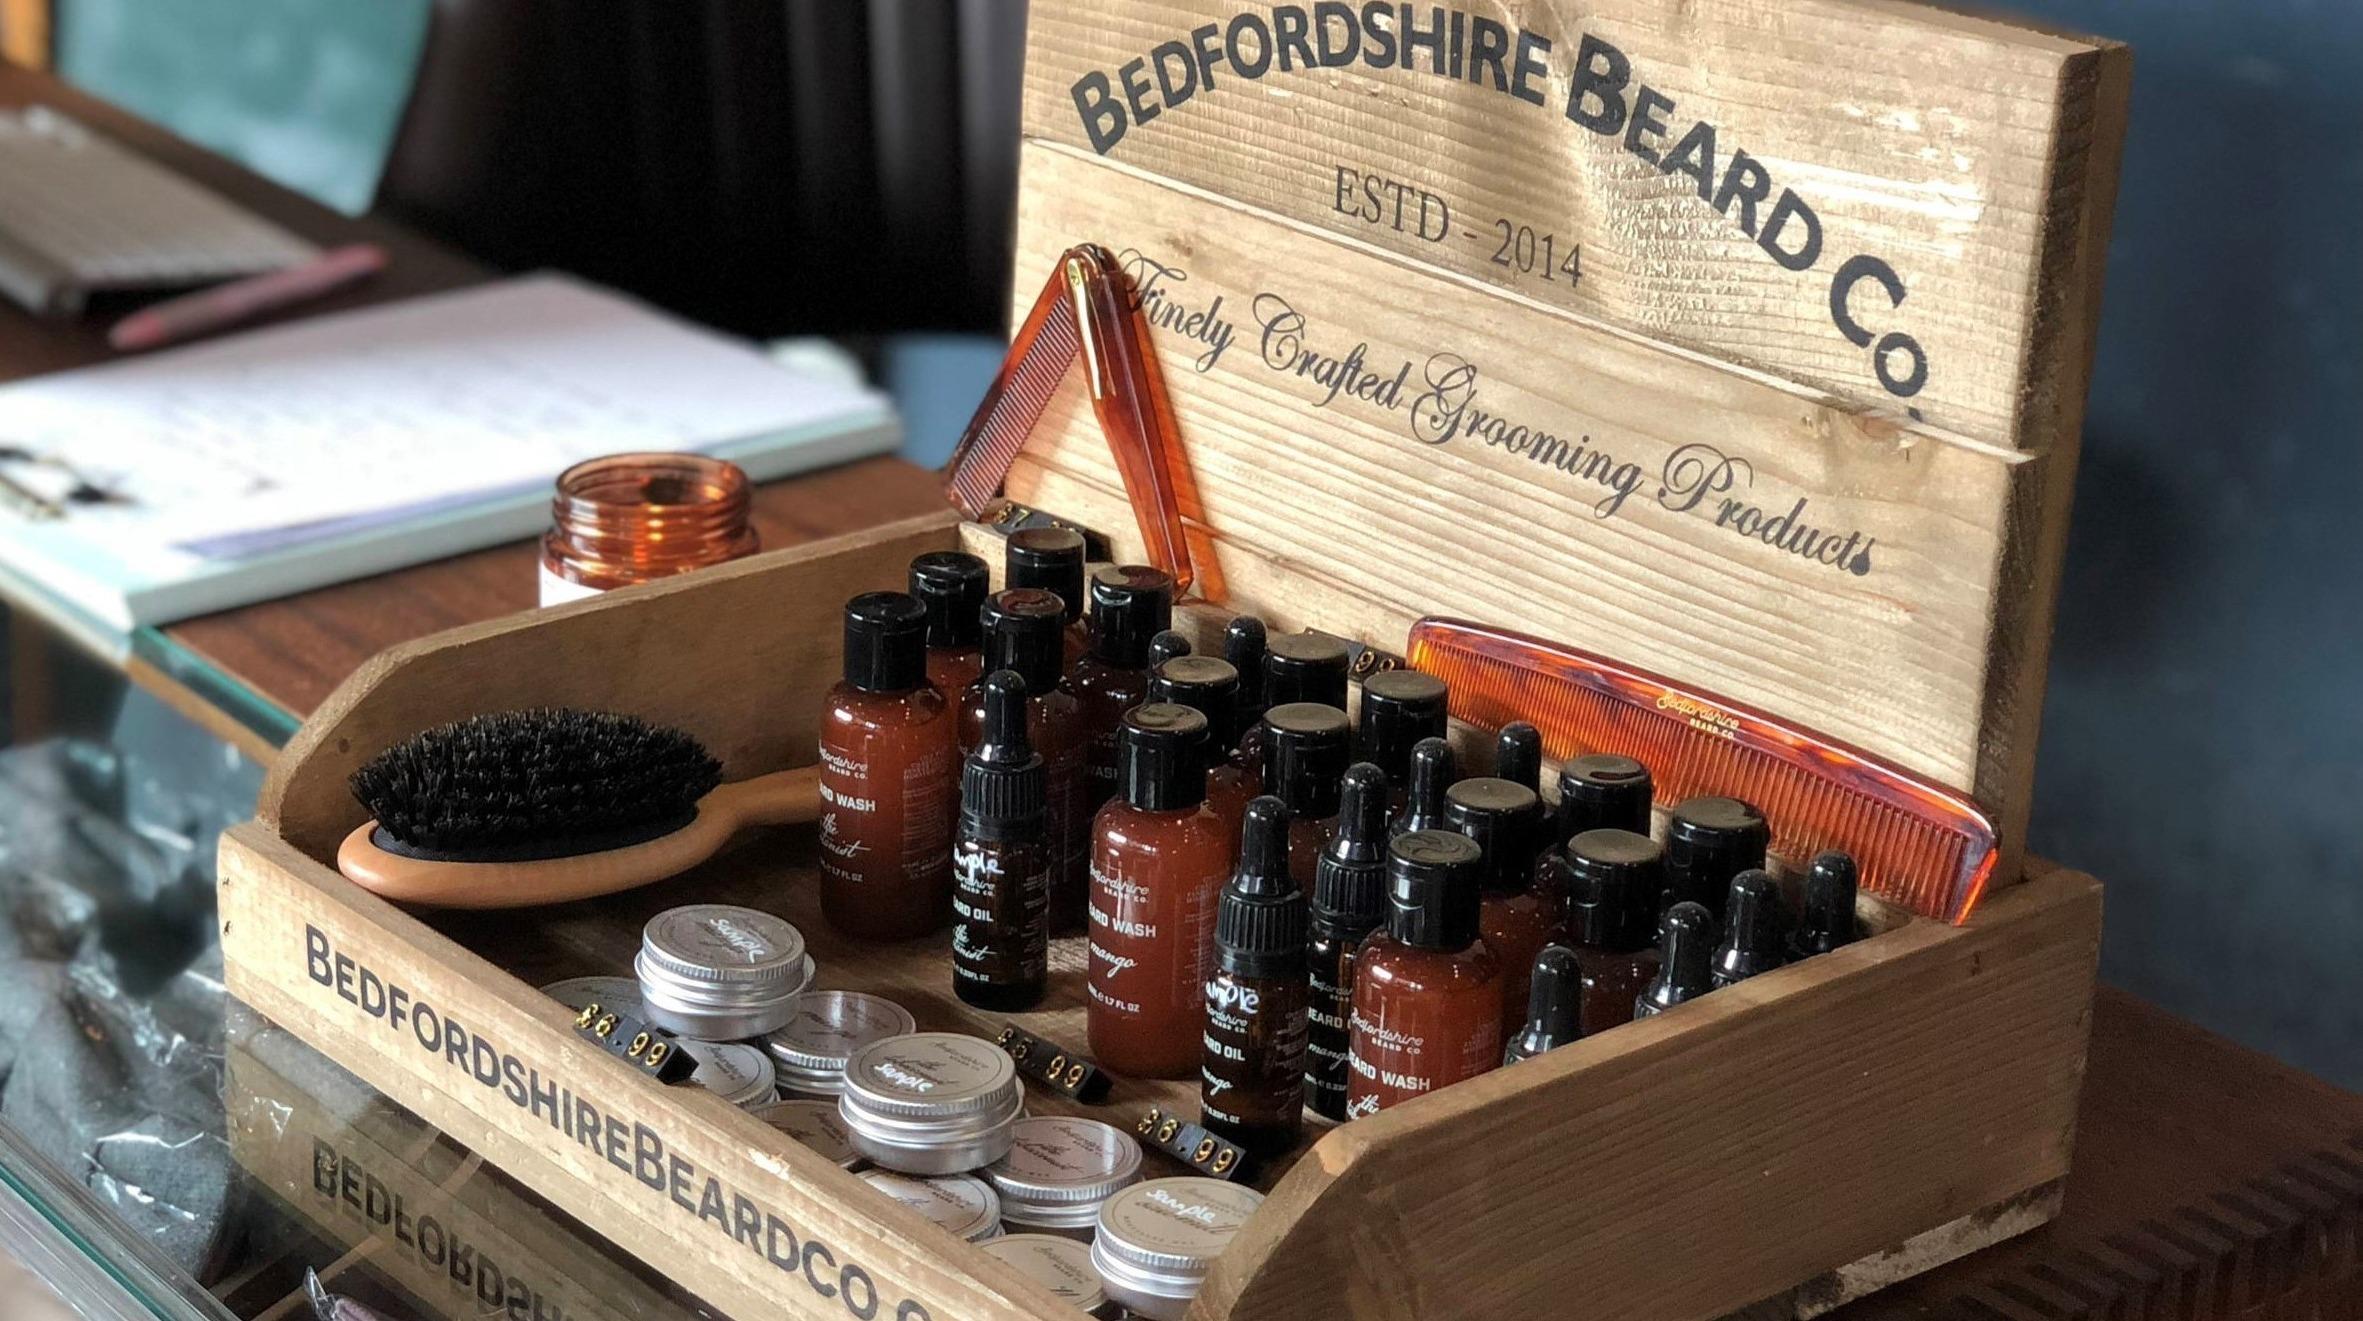 Fine beard oil & beard grooming kits for men from Bedfordshire  Beard Co.